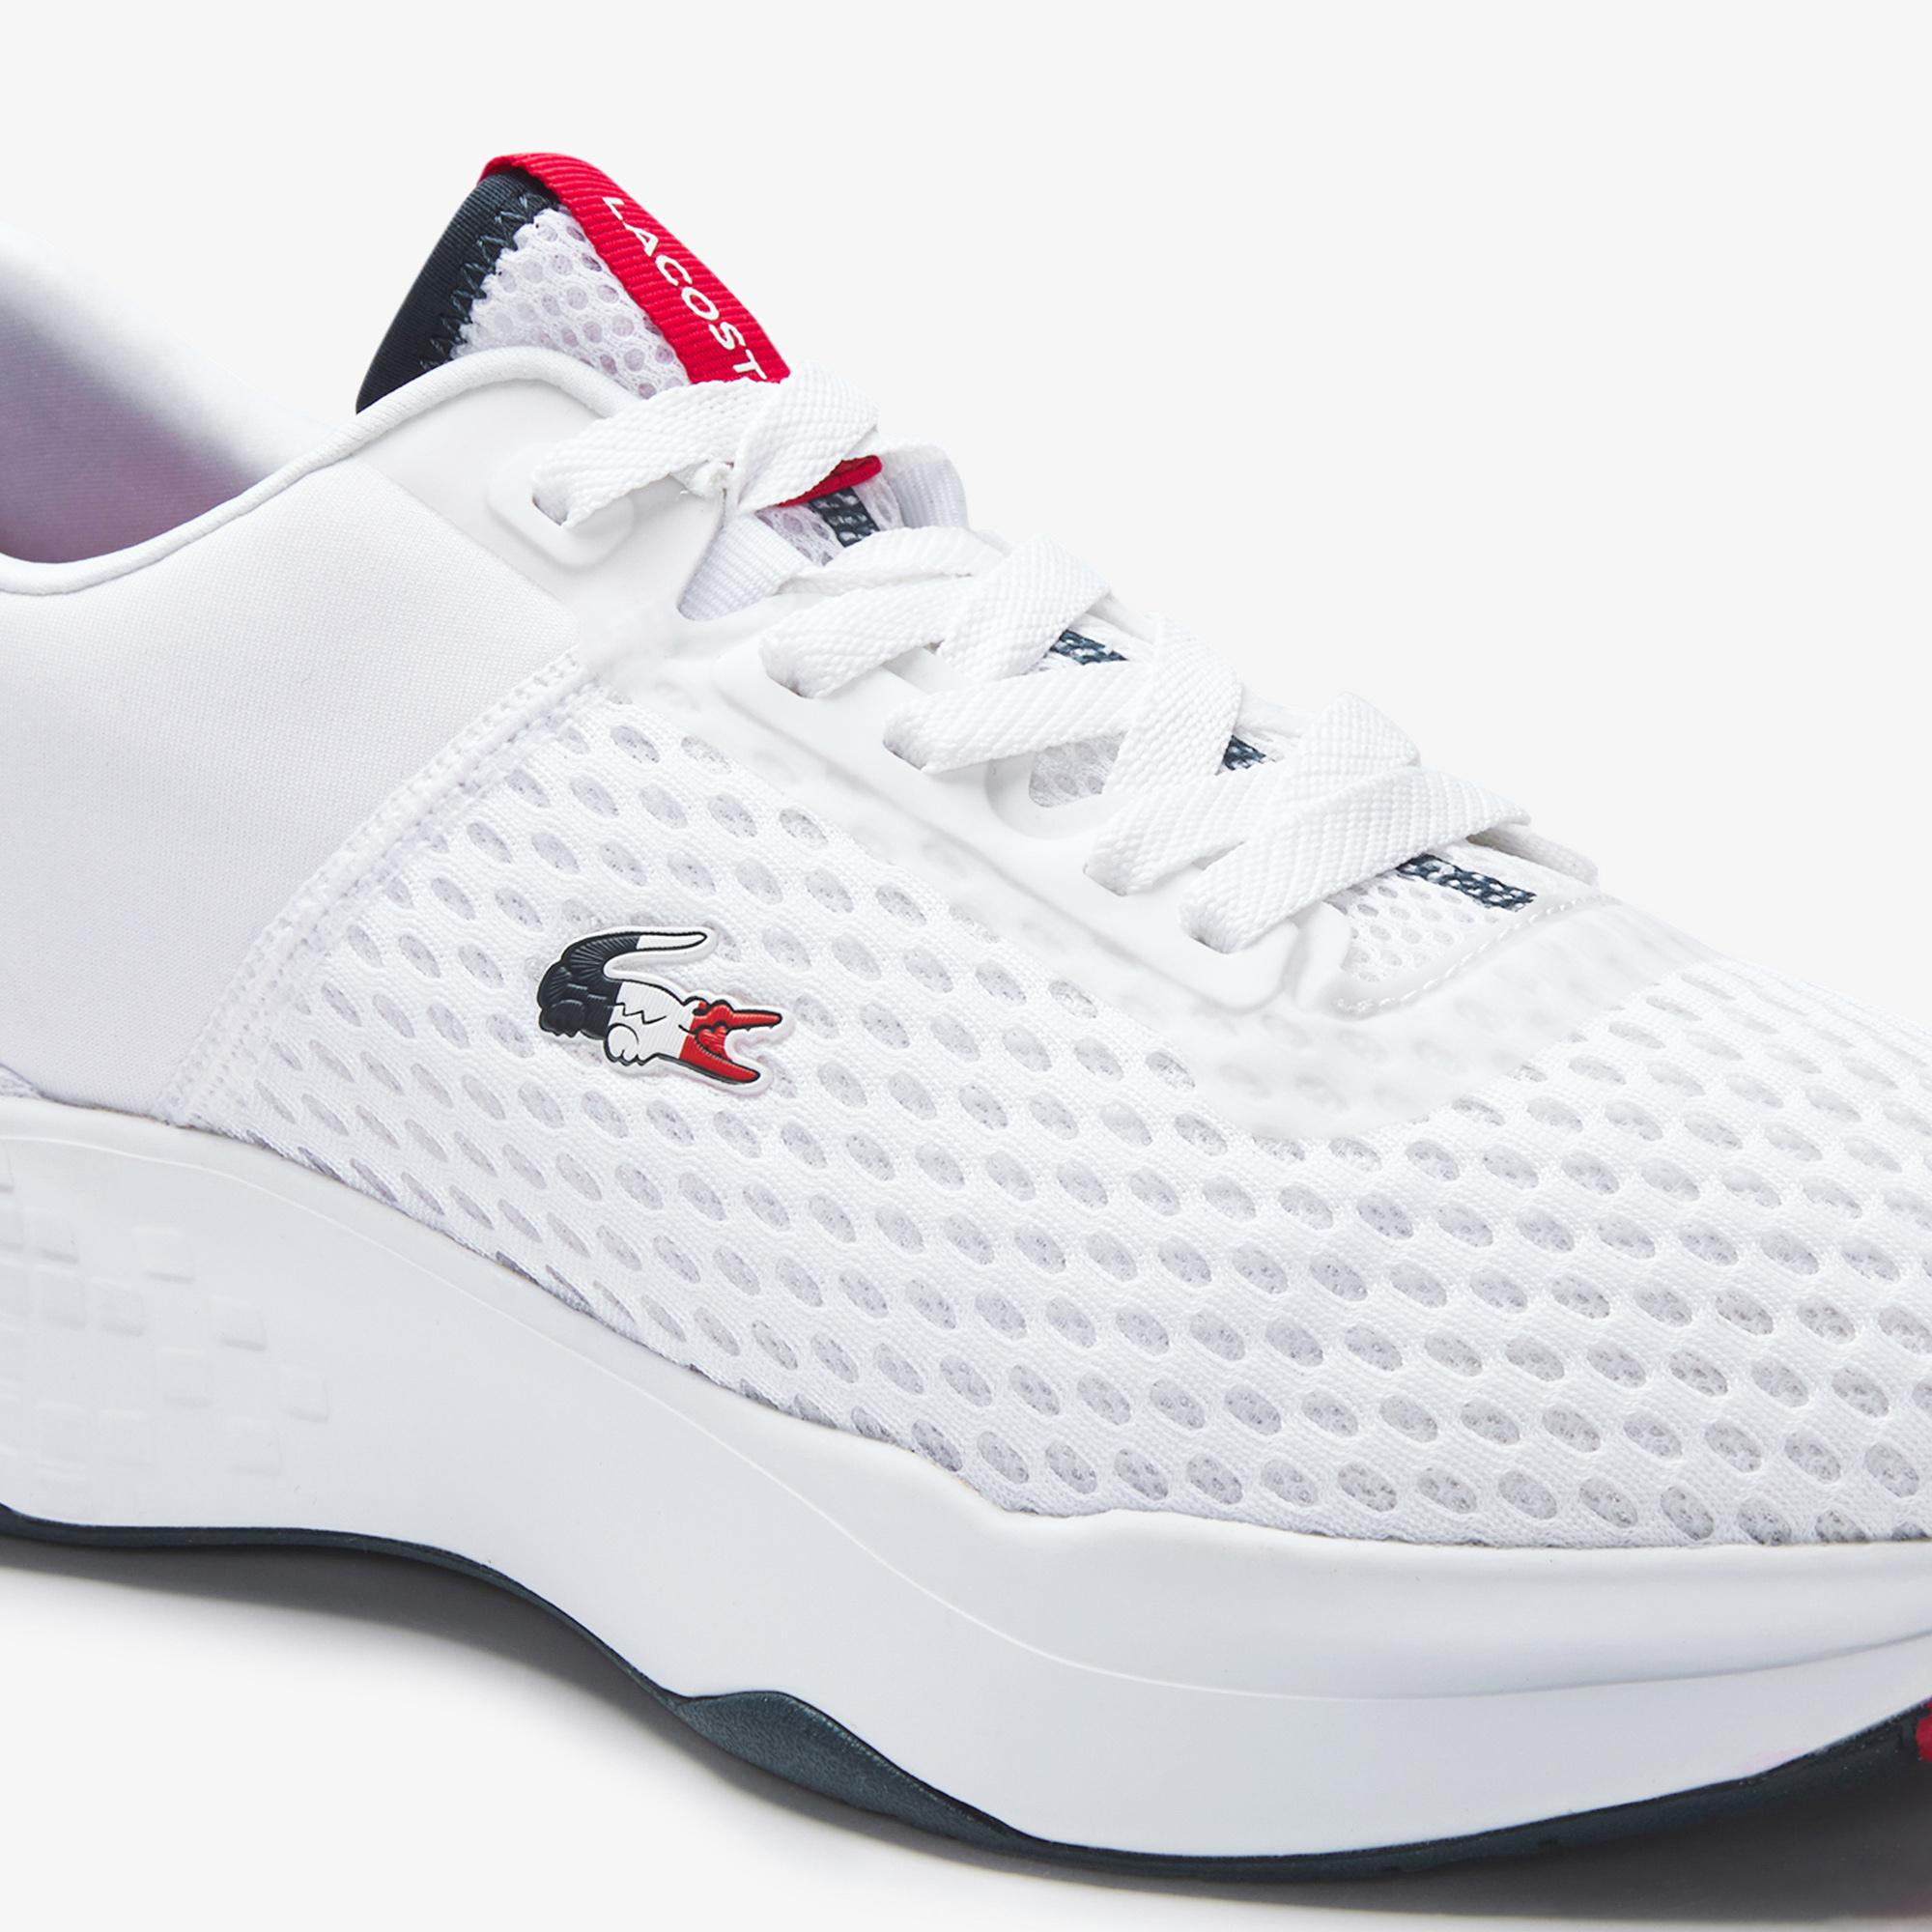 Lacoste Menerva Elite 0120 1 Cma Erkek Beyaz Sneaker